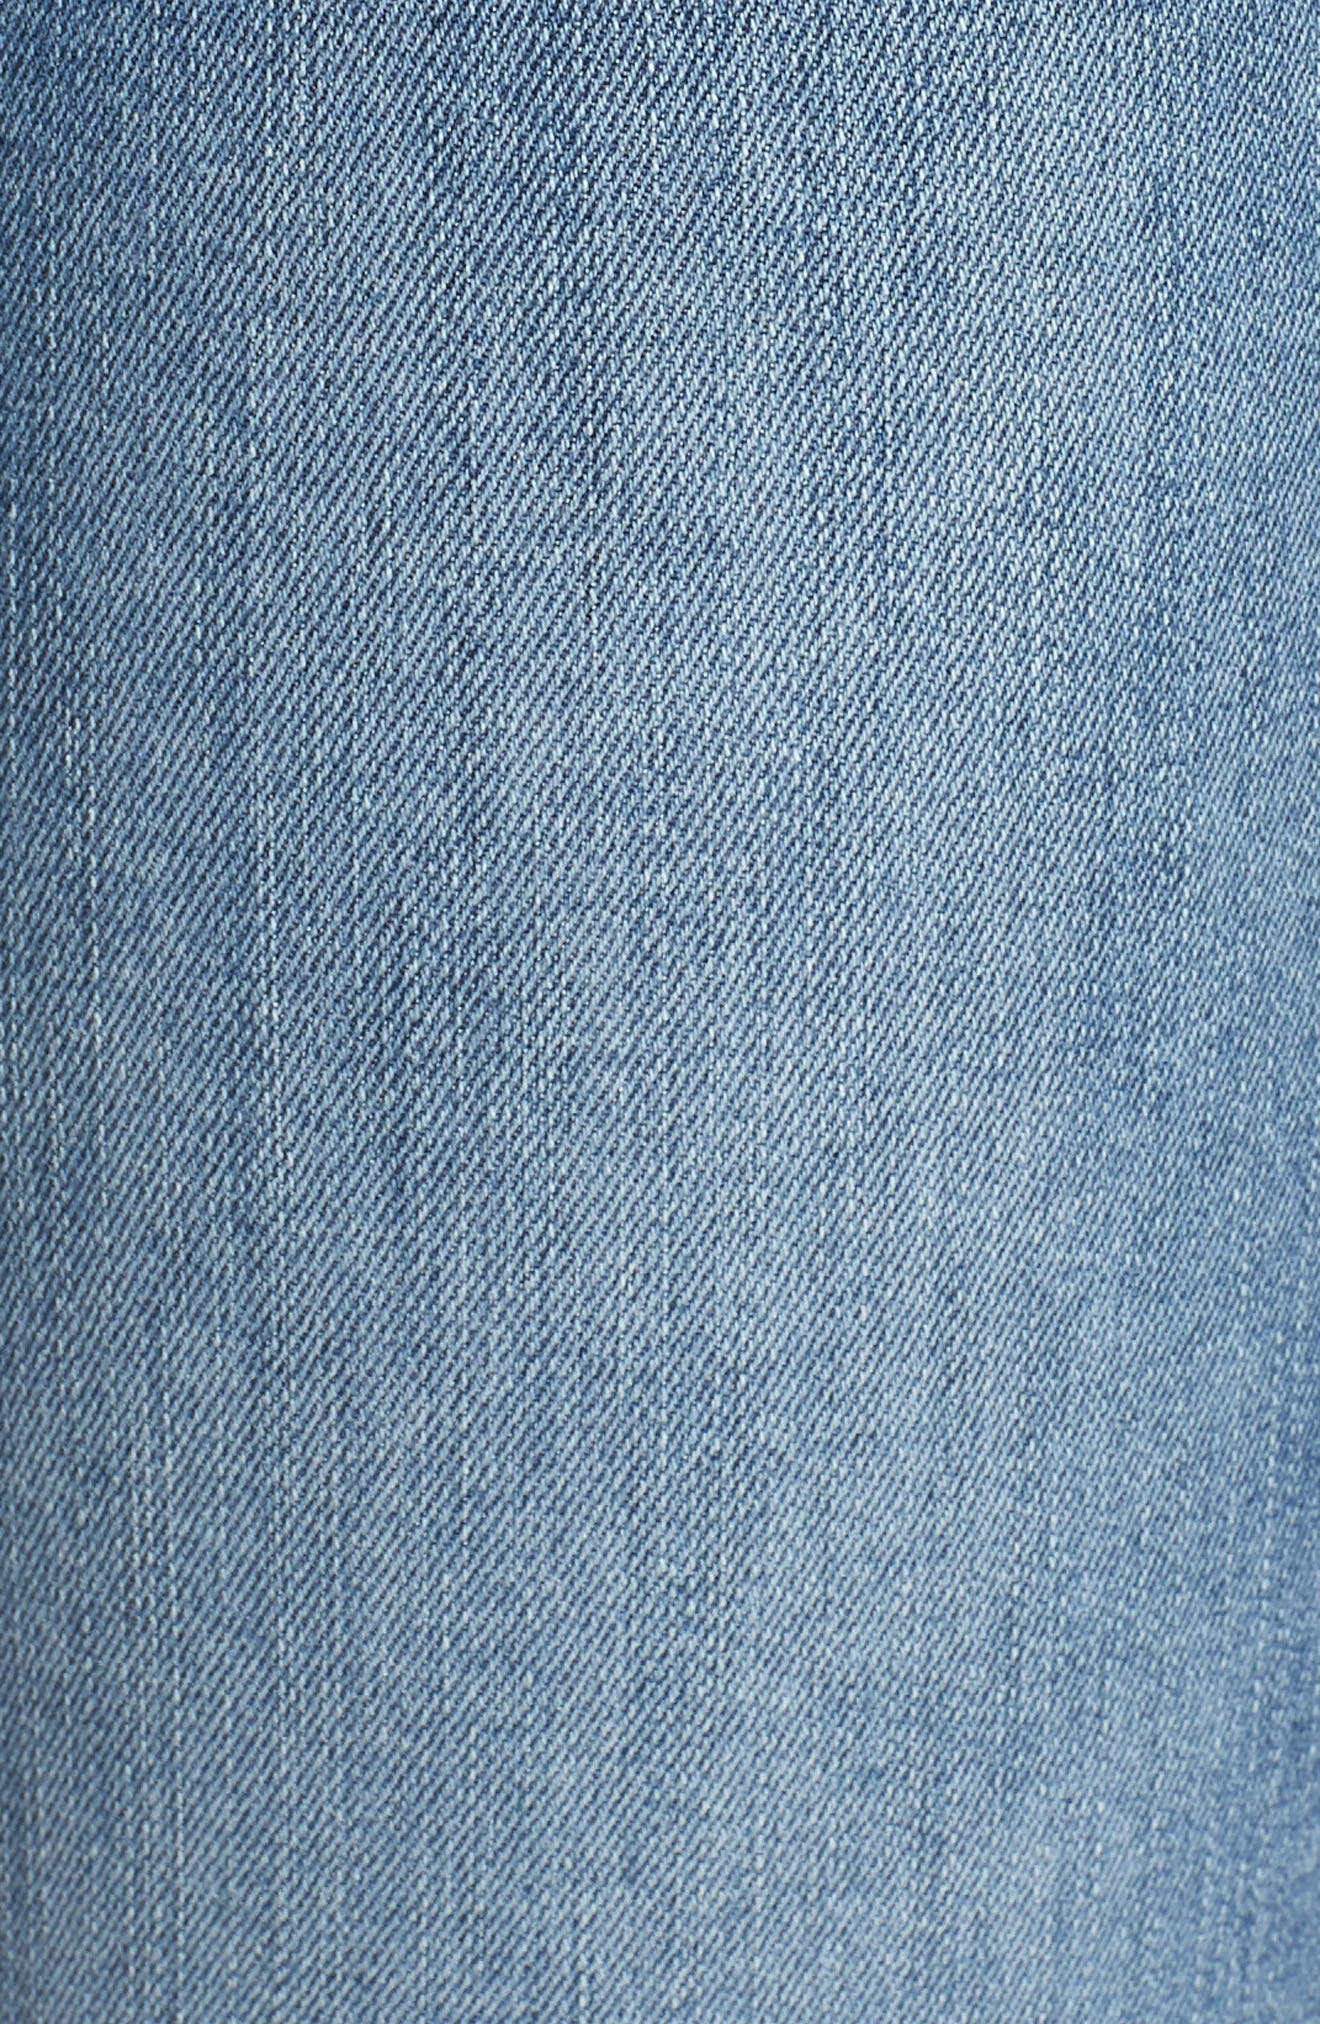 Transcend Vintage - Hoxton High Waist Ankle Skinny Jeans,                             Alternate thumbnail 6, color,                             ZAHARA